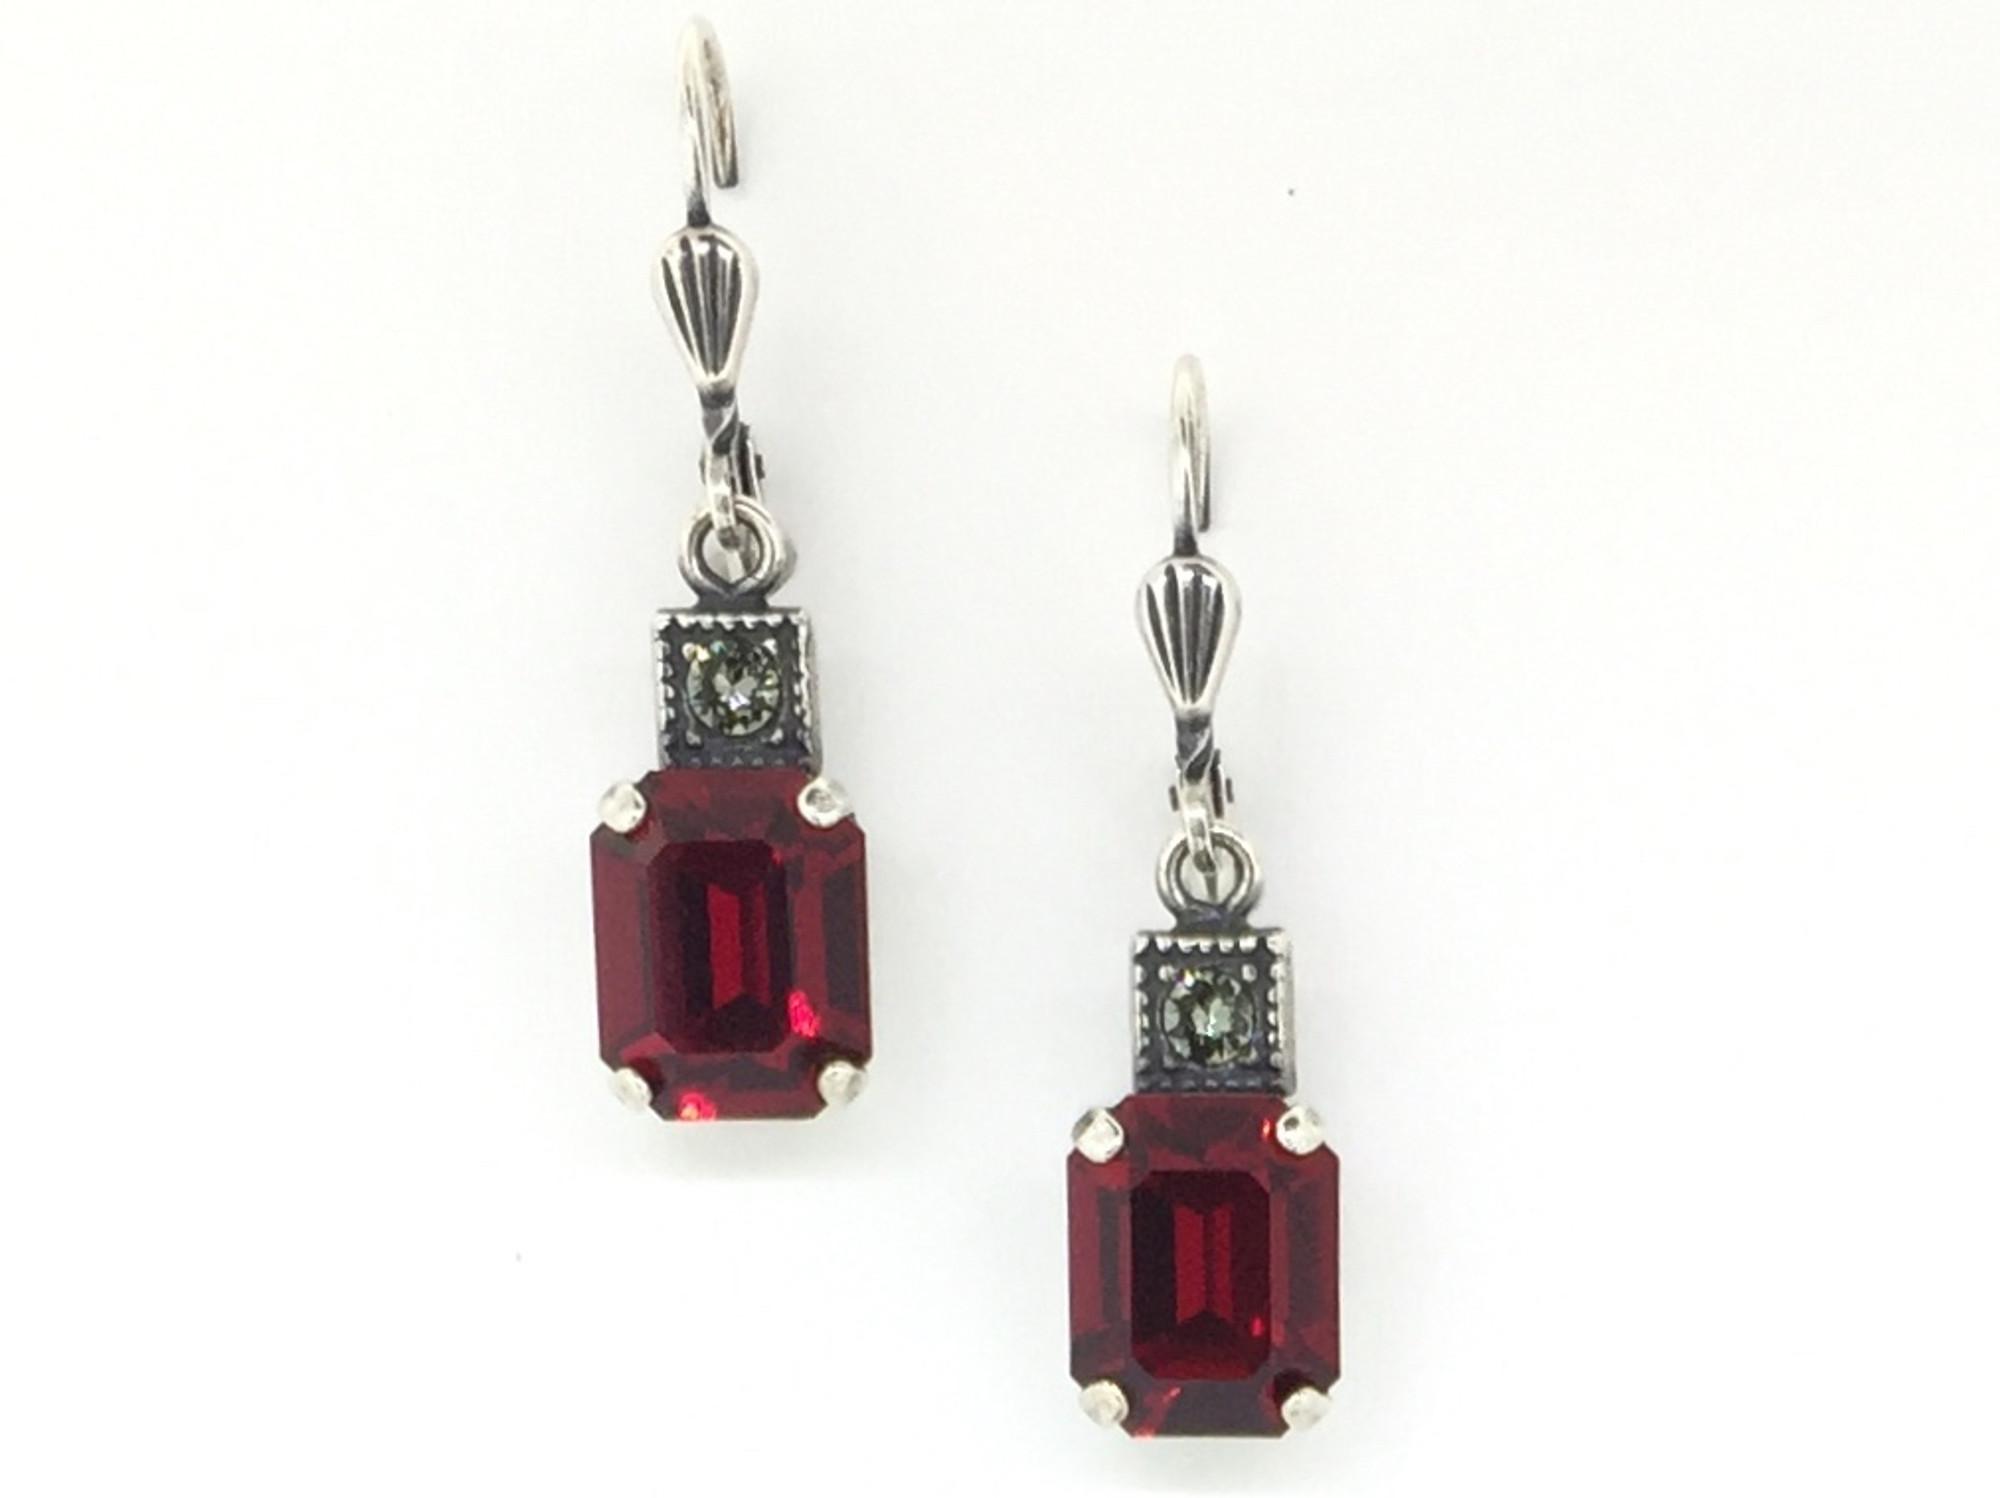 8adb71bd9 Small Silver Rectangle Siam Crystal Earrings - Mima's Of Warwick, LLC